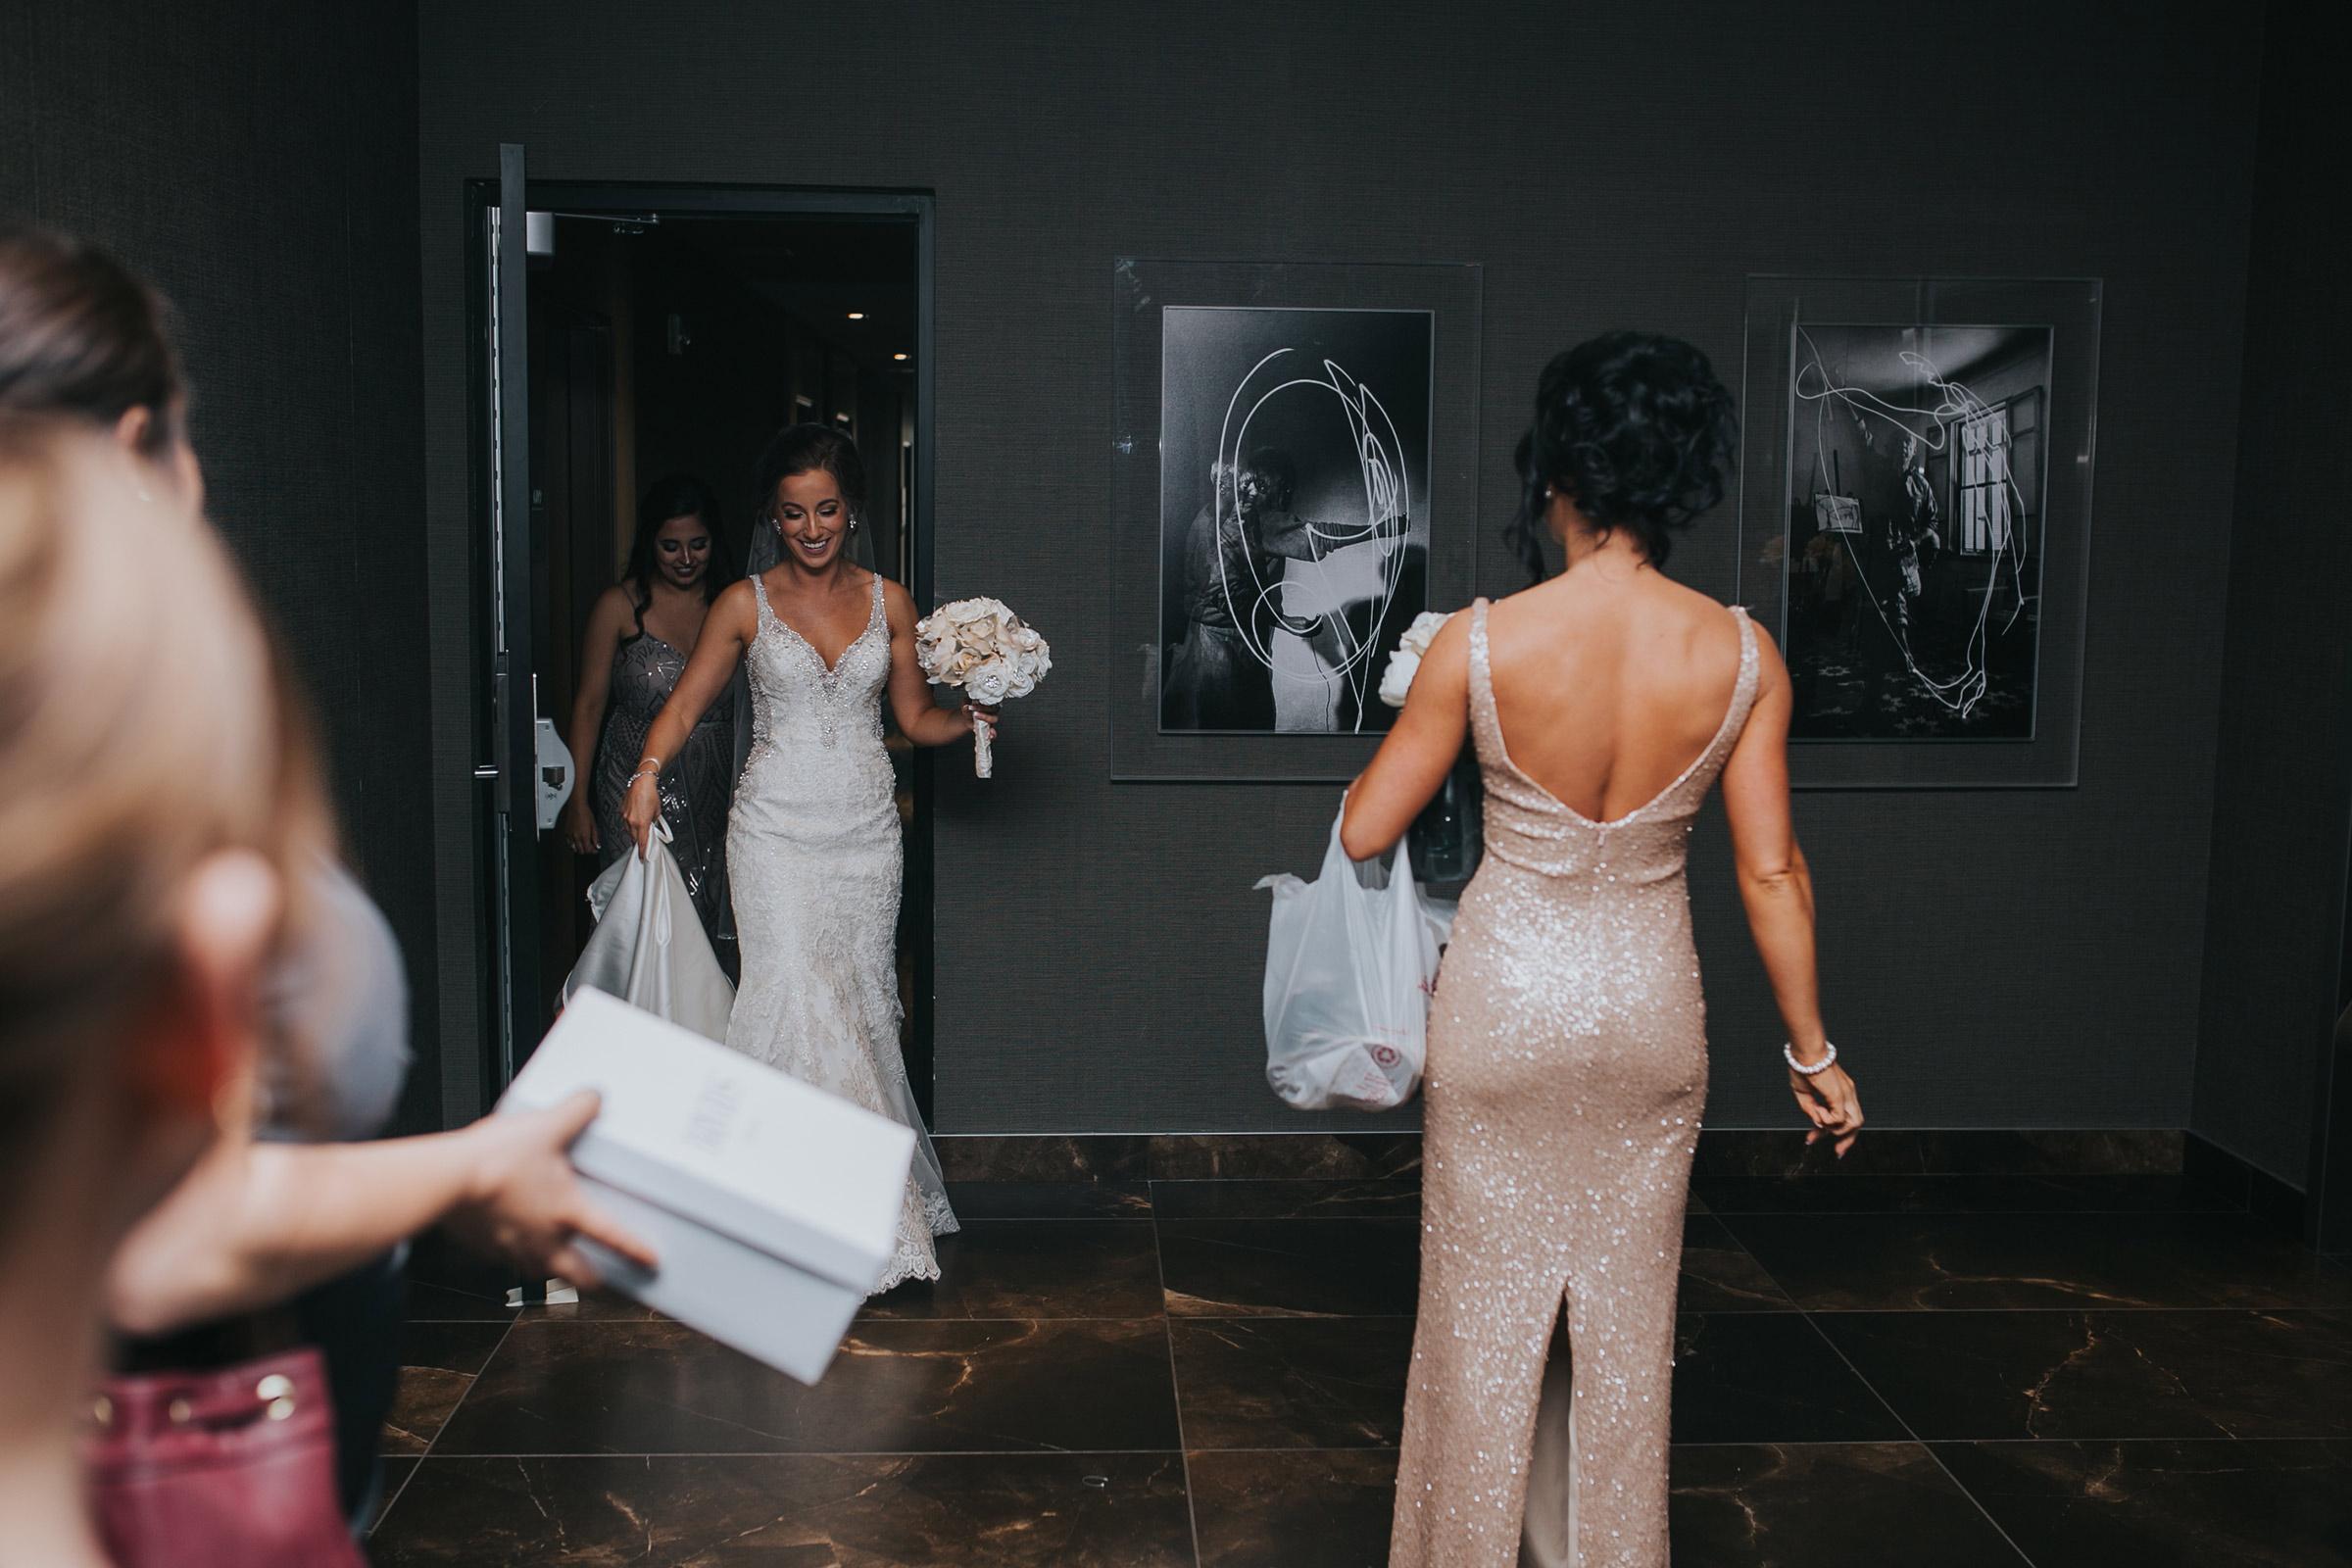 bride-leaving-hotel-room-desmoines-iowa-ac-hotel-raelyn-ramey-photography.jpg